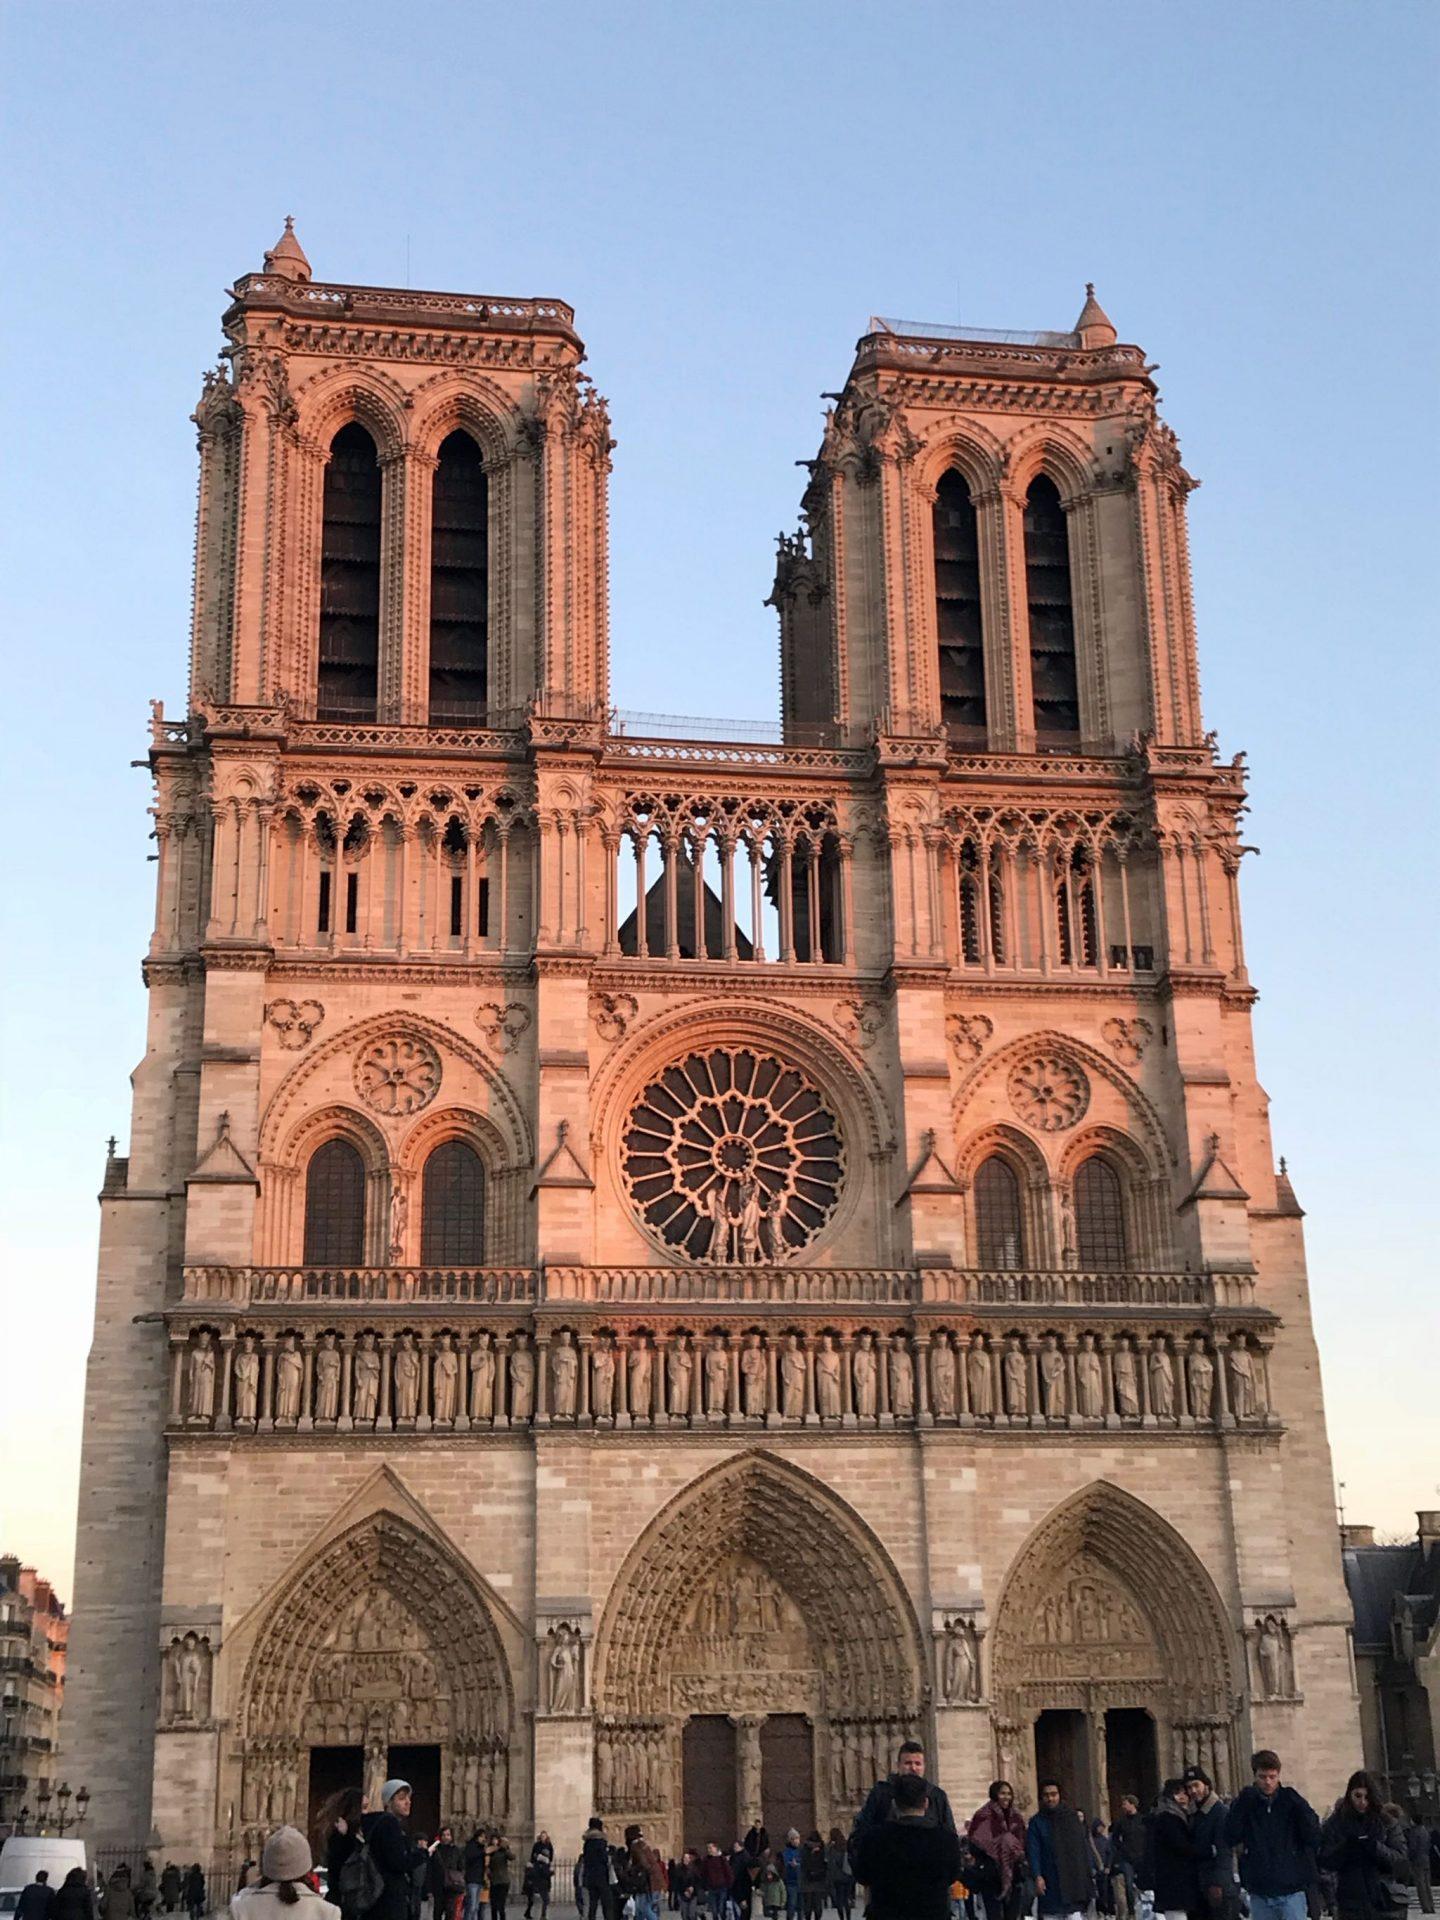 Notre Dame Paris at Sunset